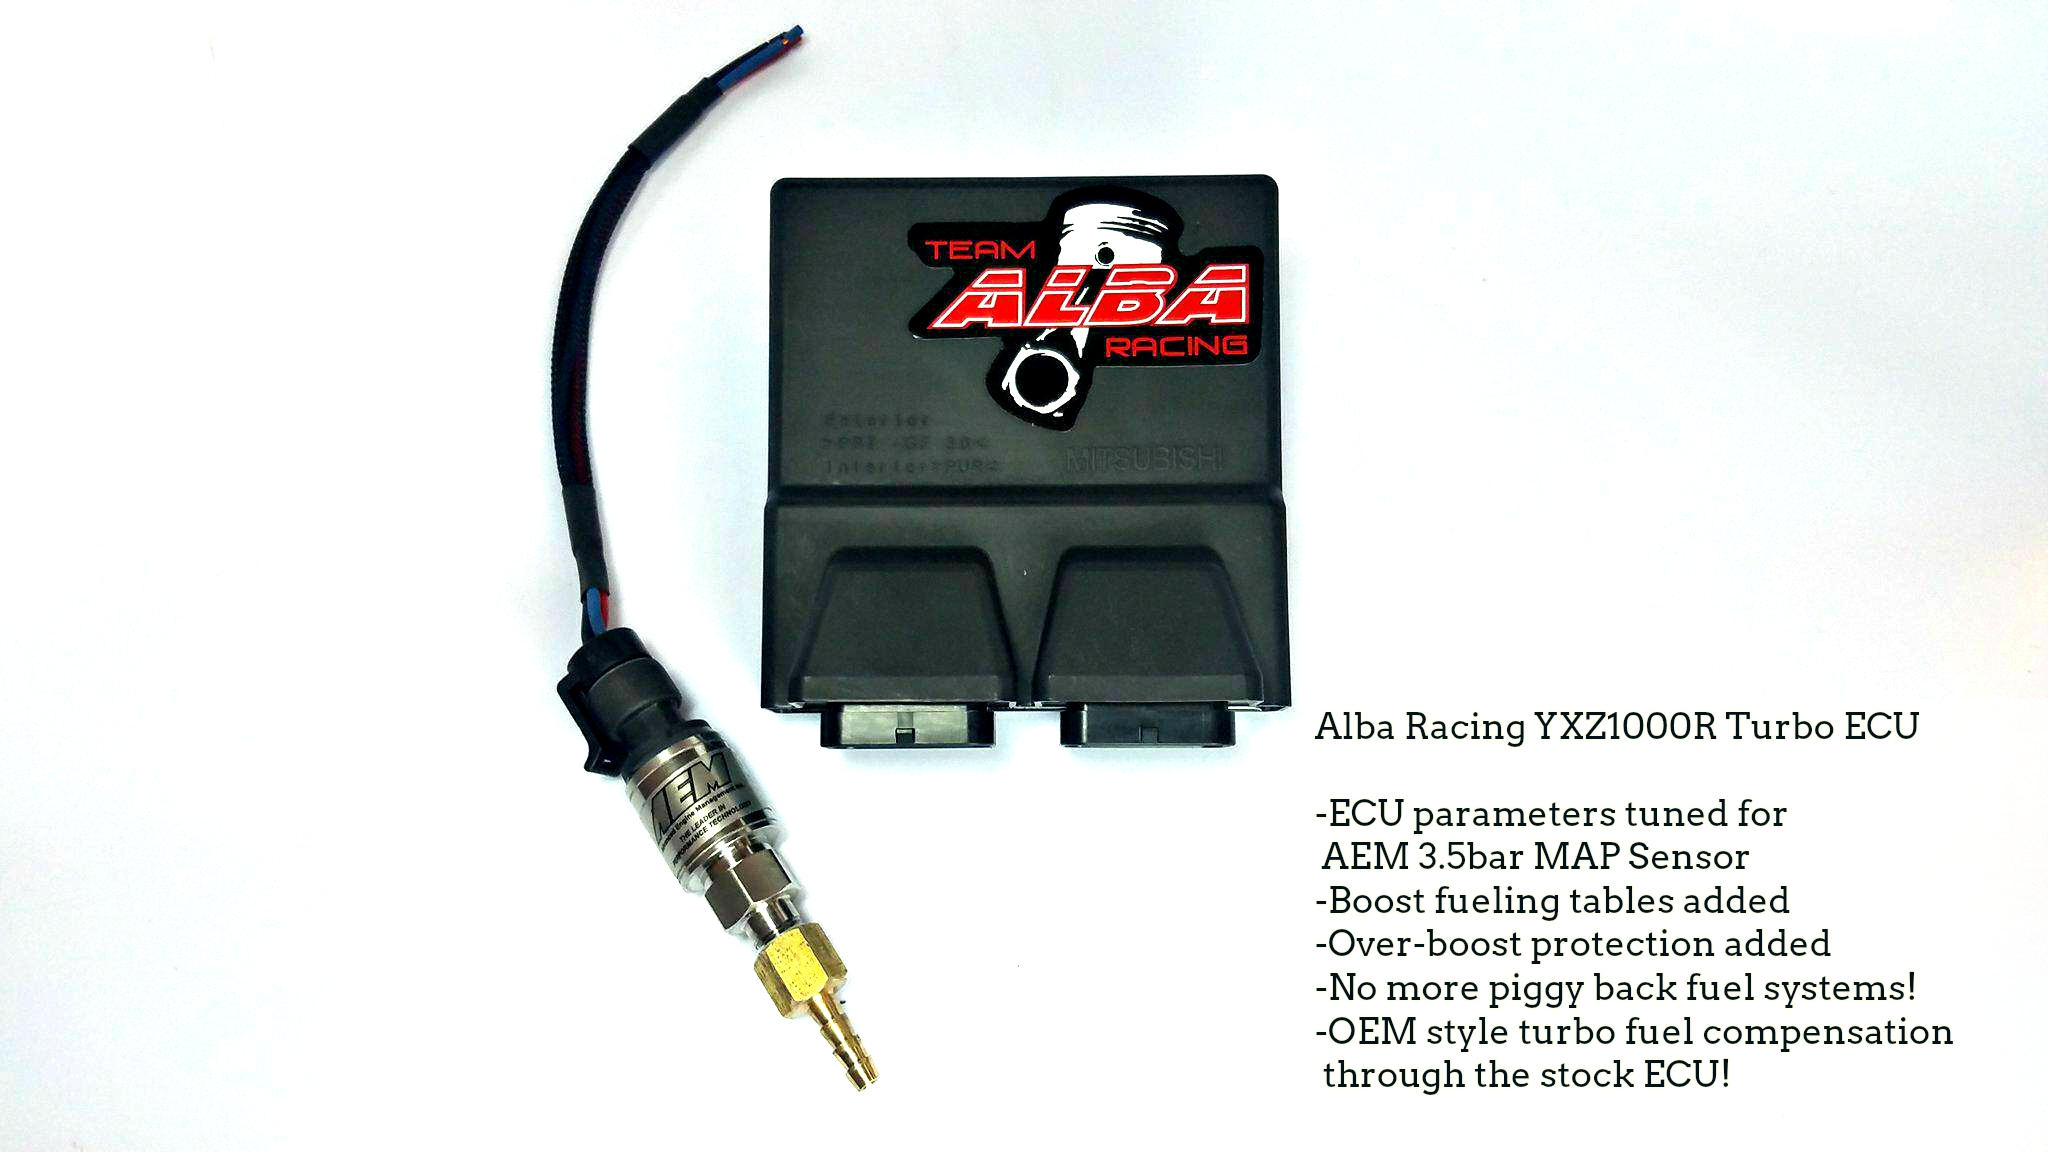 Alba Racing 3 5bar OEM ECU Turbo flash! | Yamaha YXZ Forums